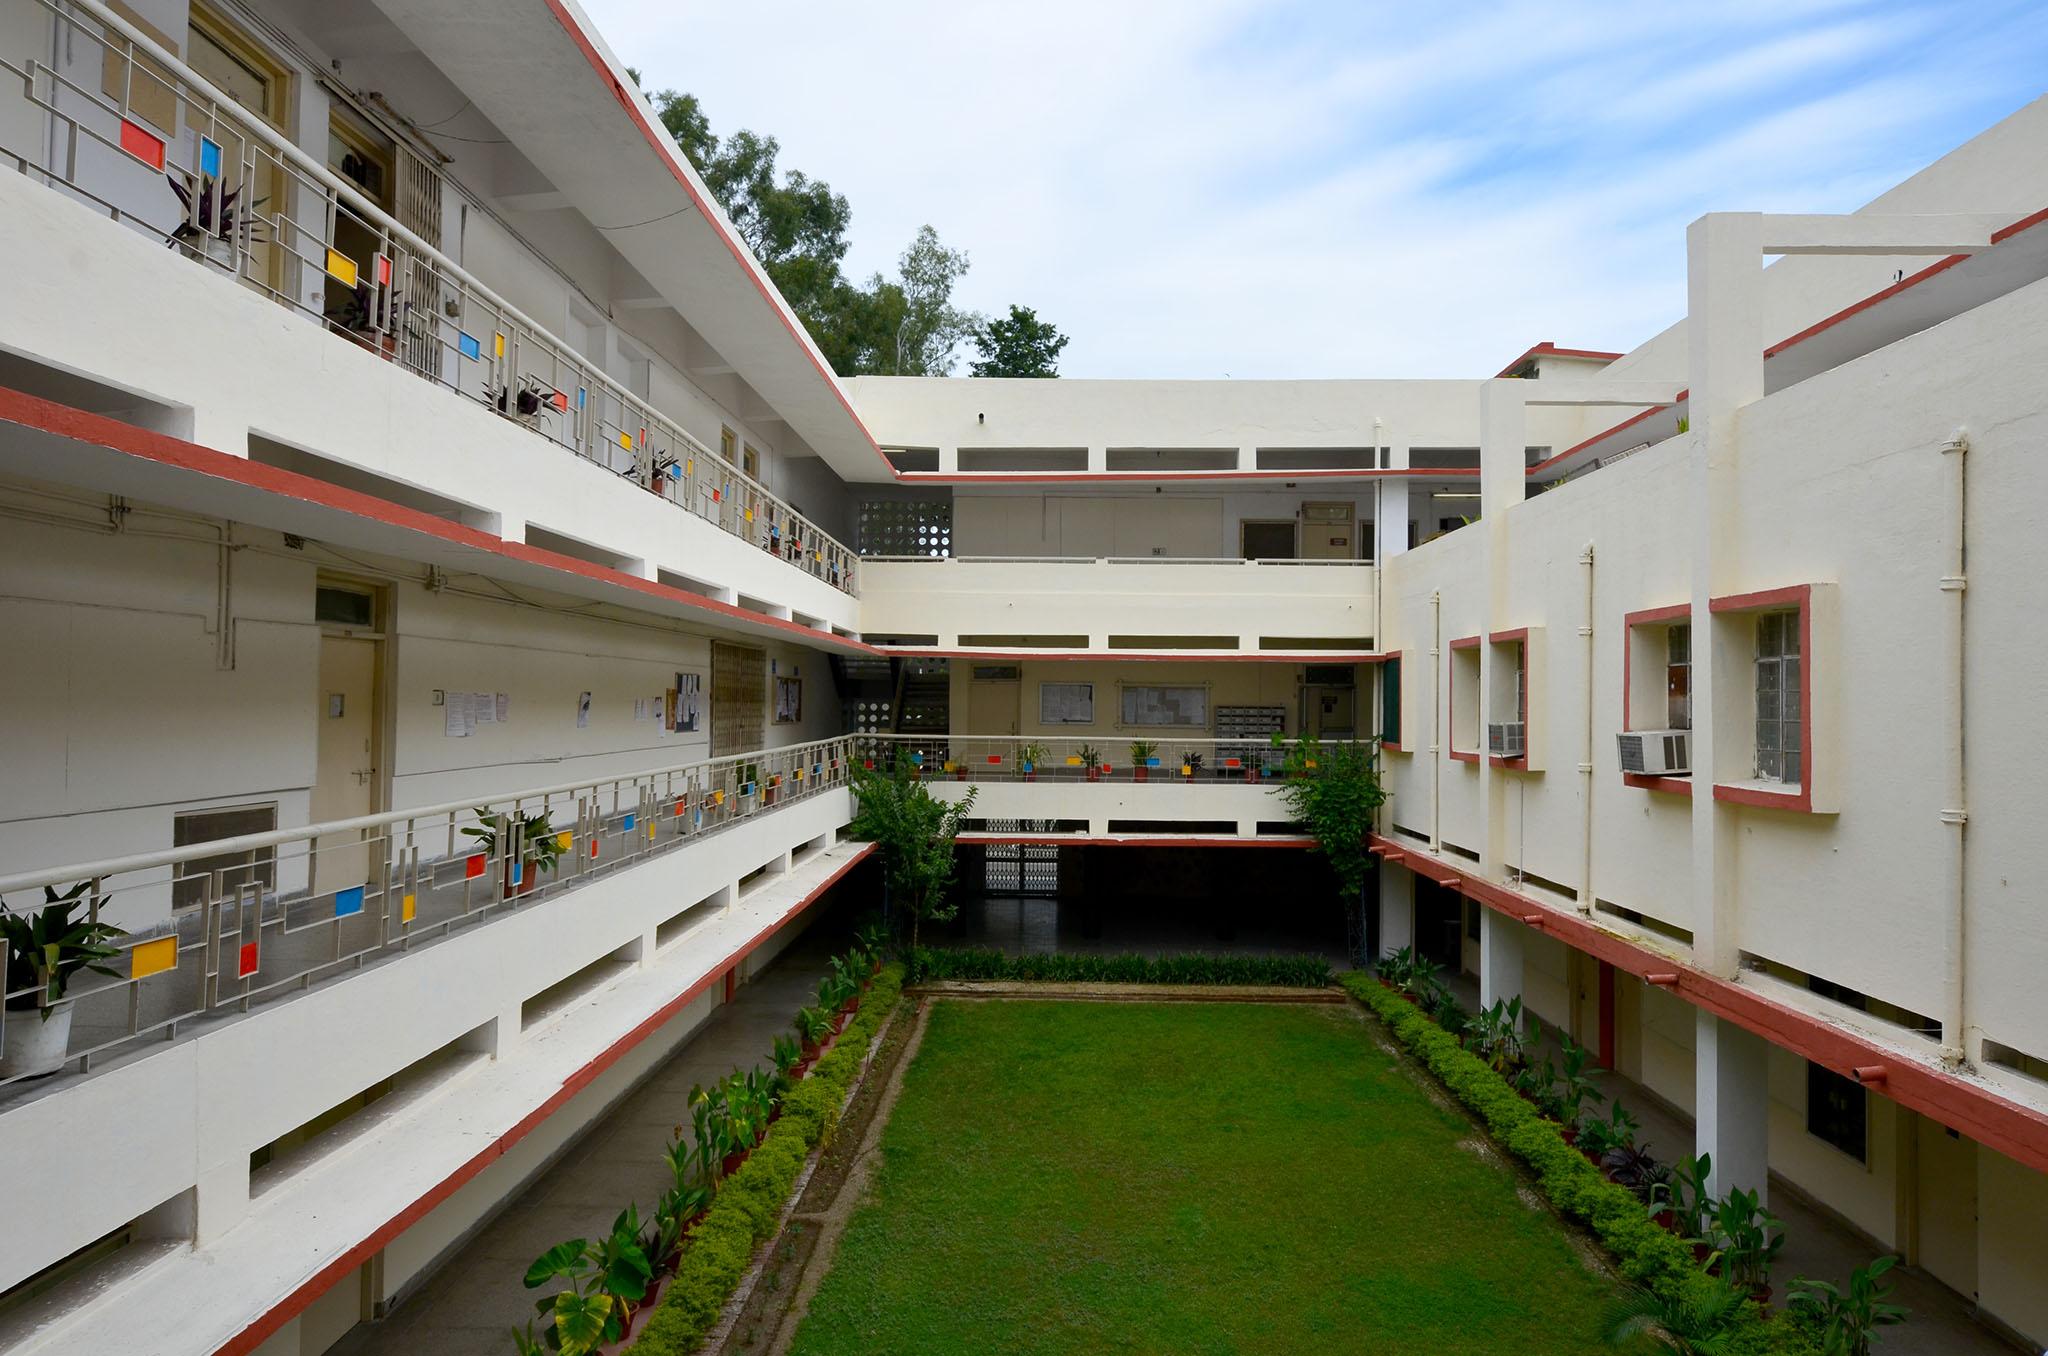 indian-institute-of-technology-delhi 2